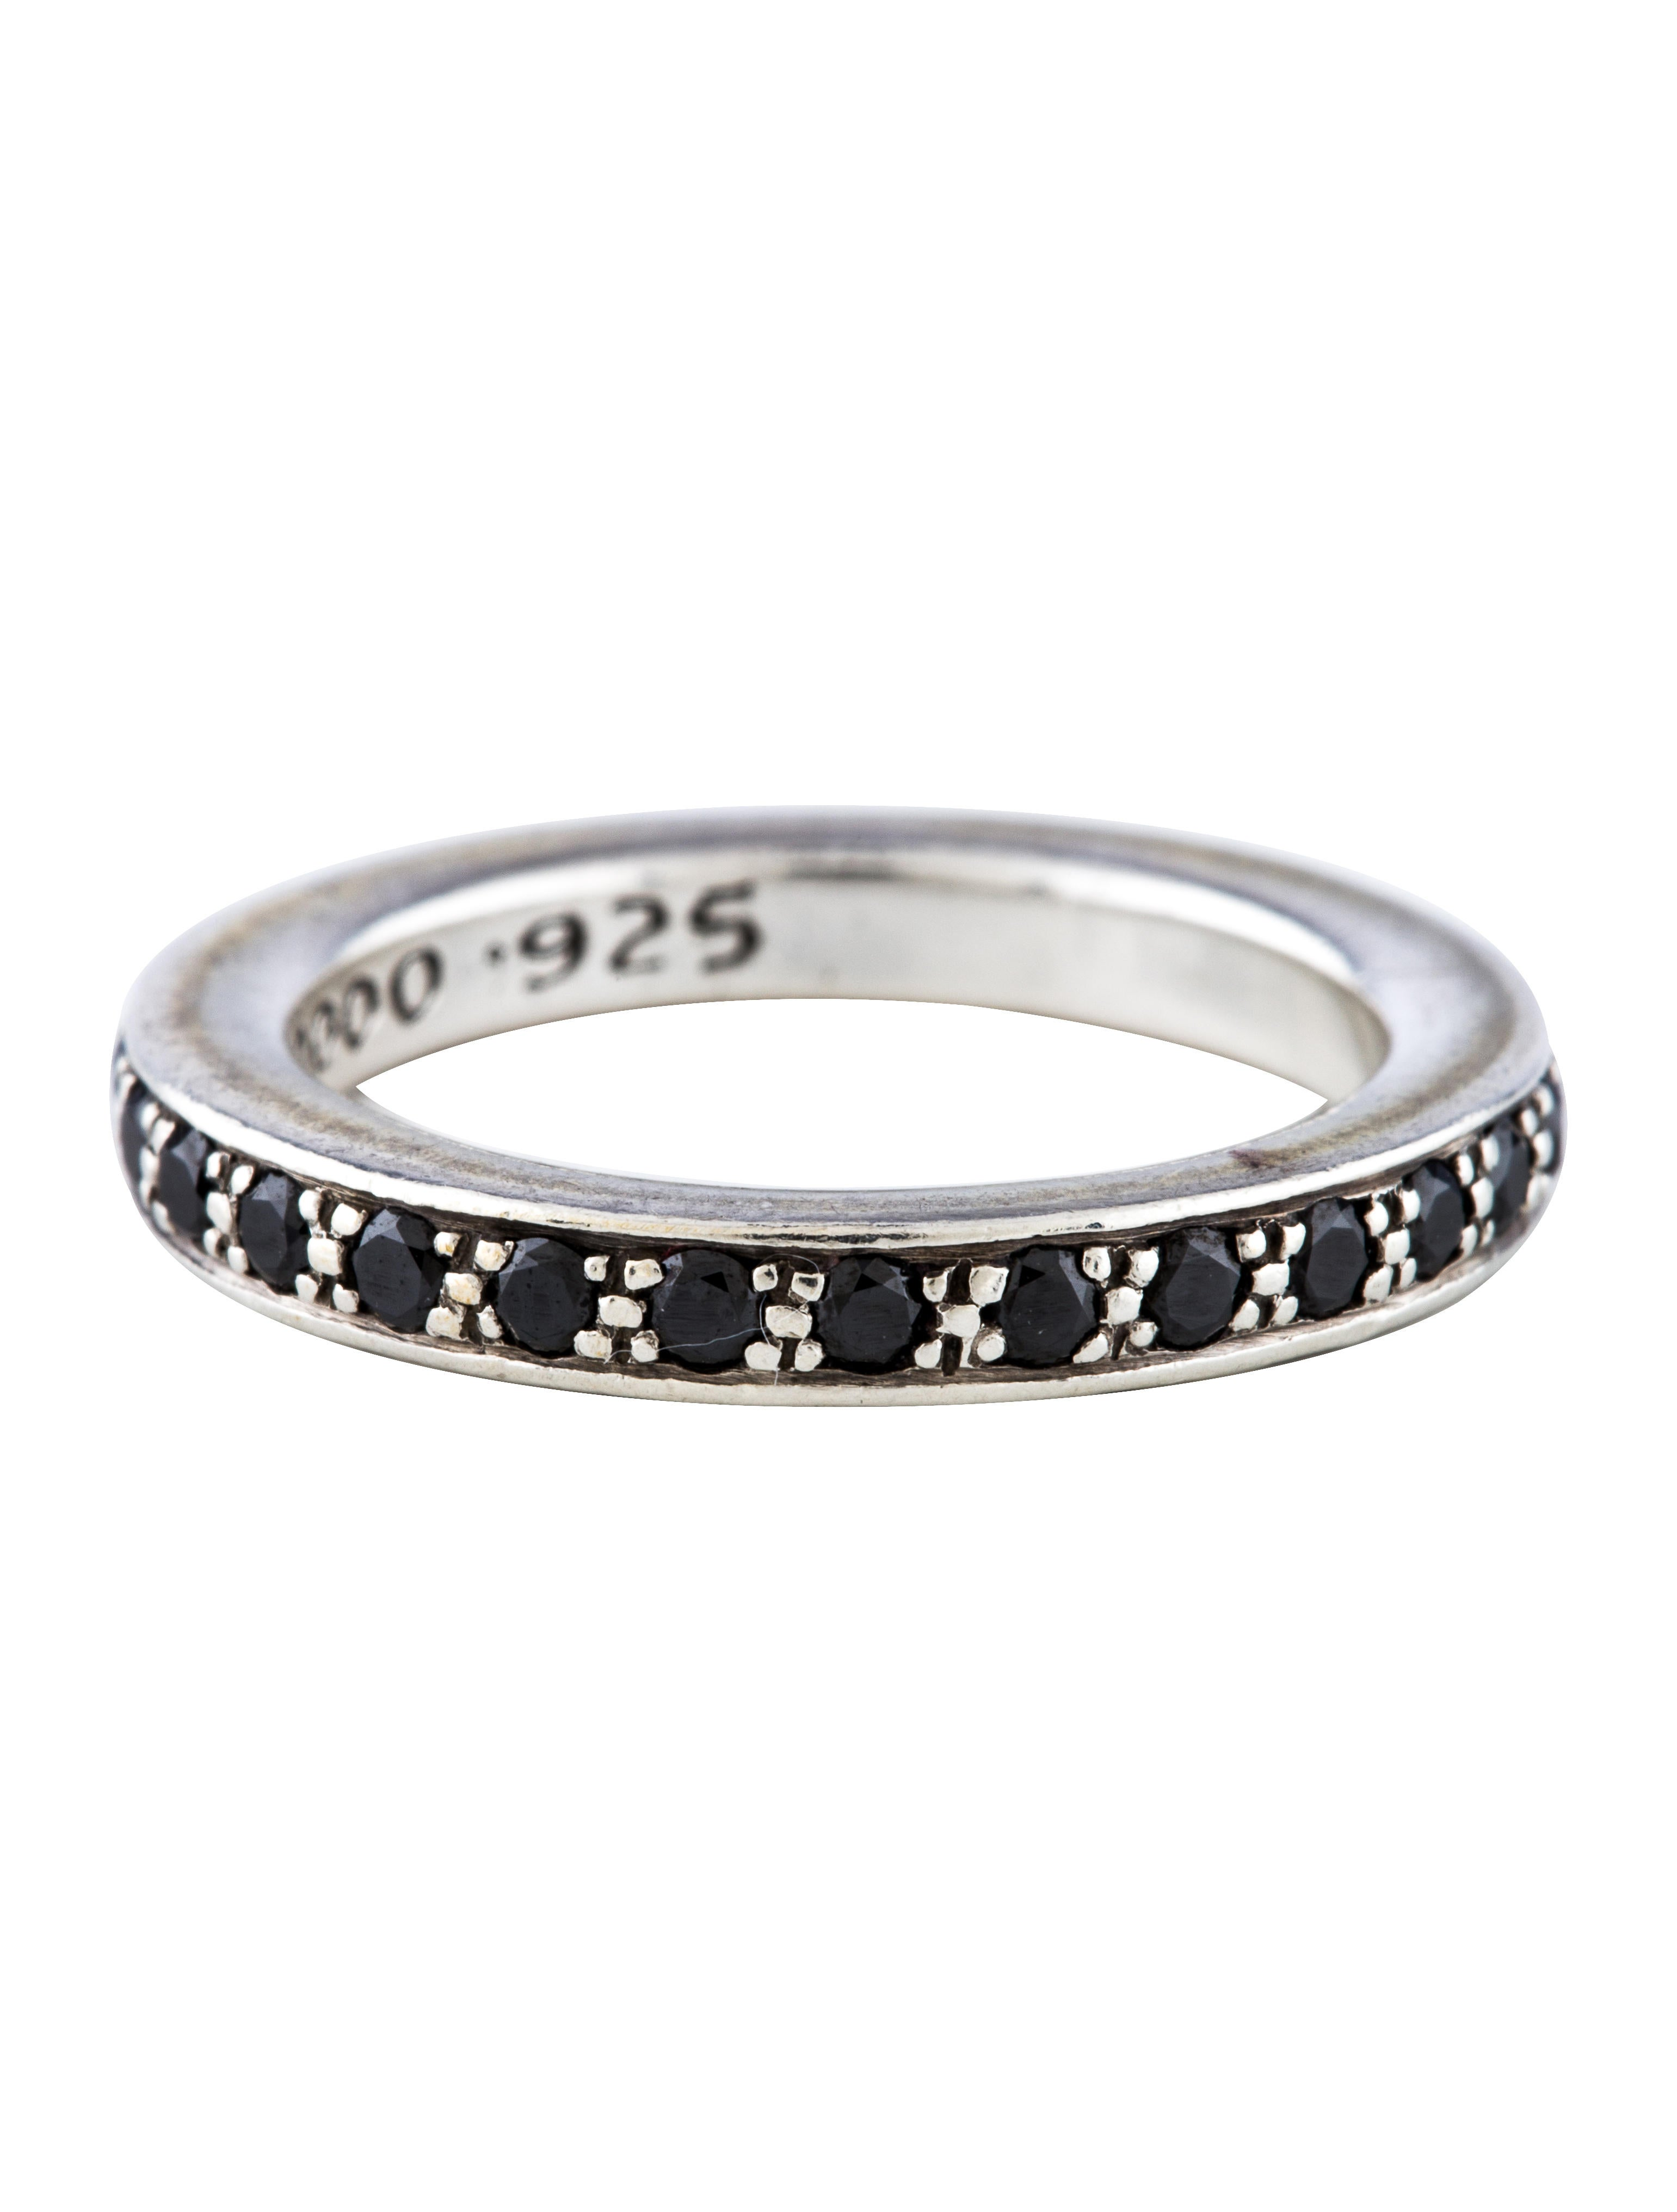 947ece6df30c Chrome Hearts Diamond Eternity Ring - Rings - CHH23106